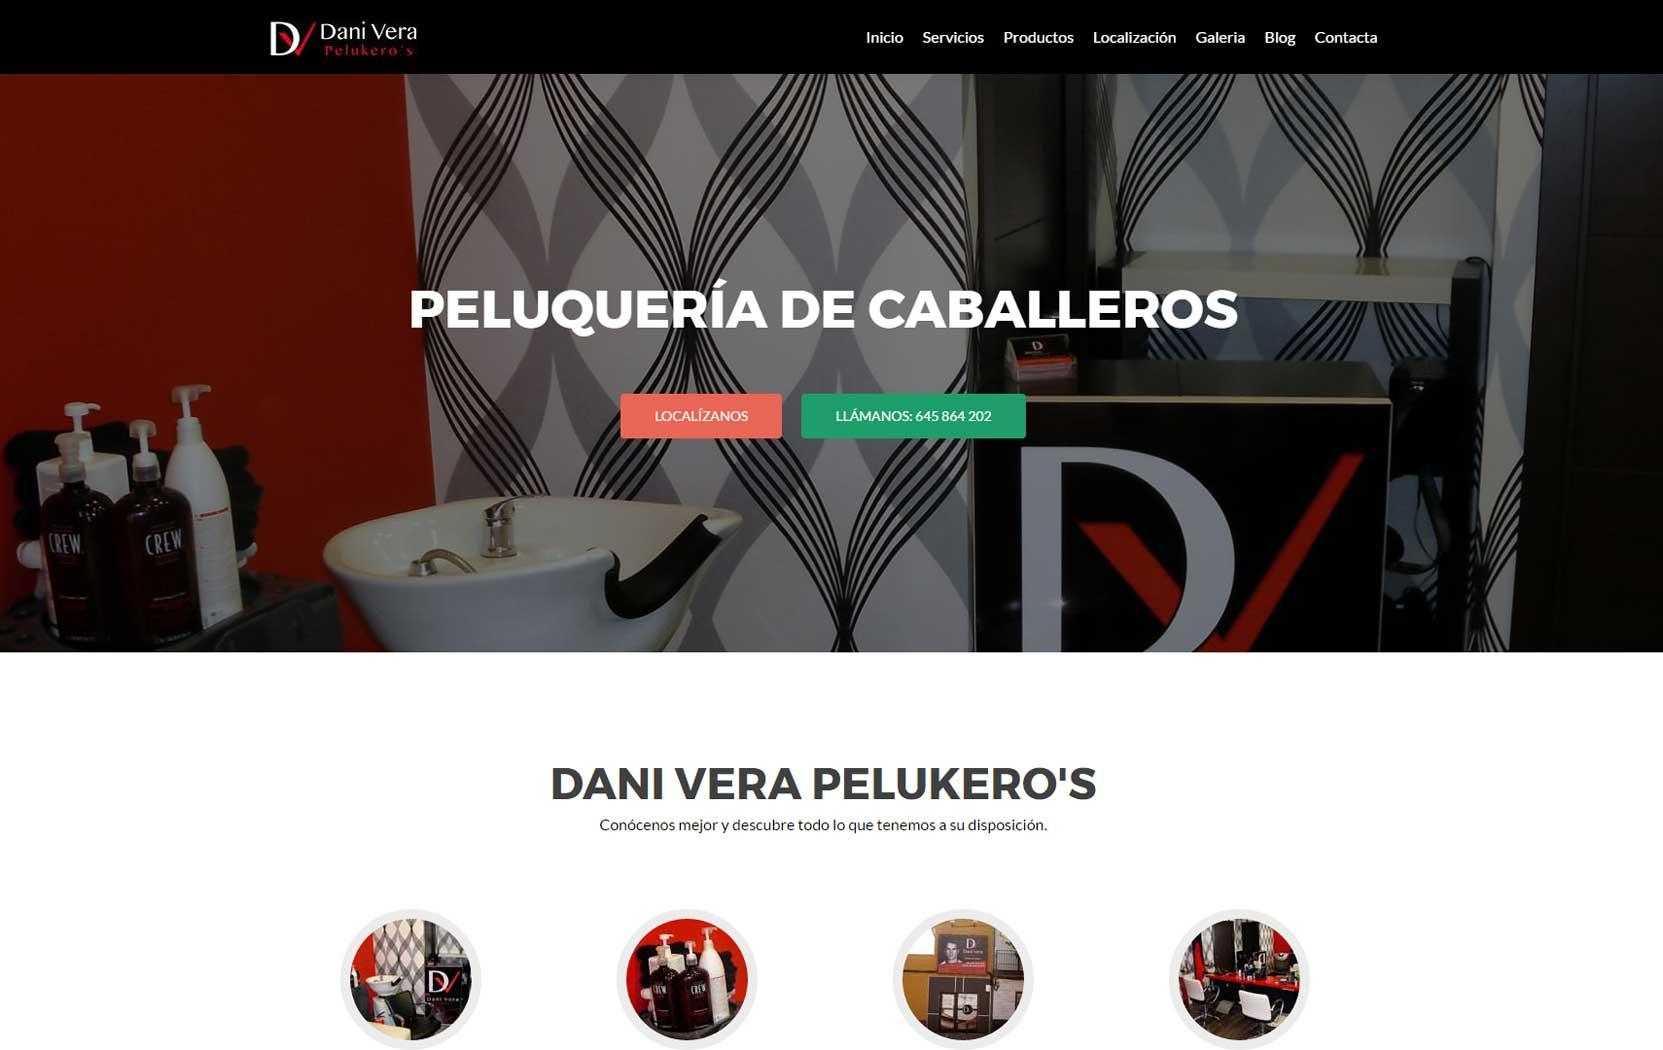 Dani Vera Pelukero's